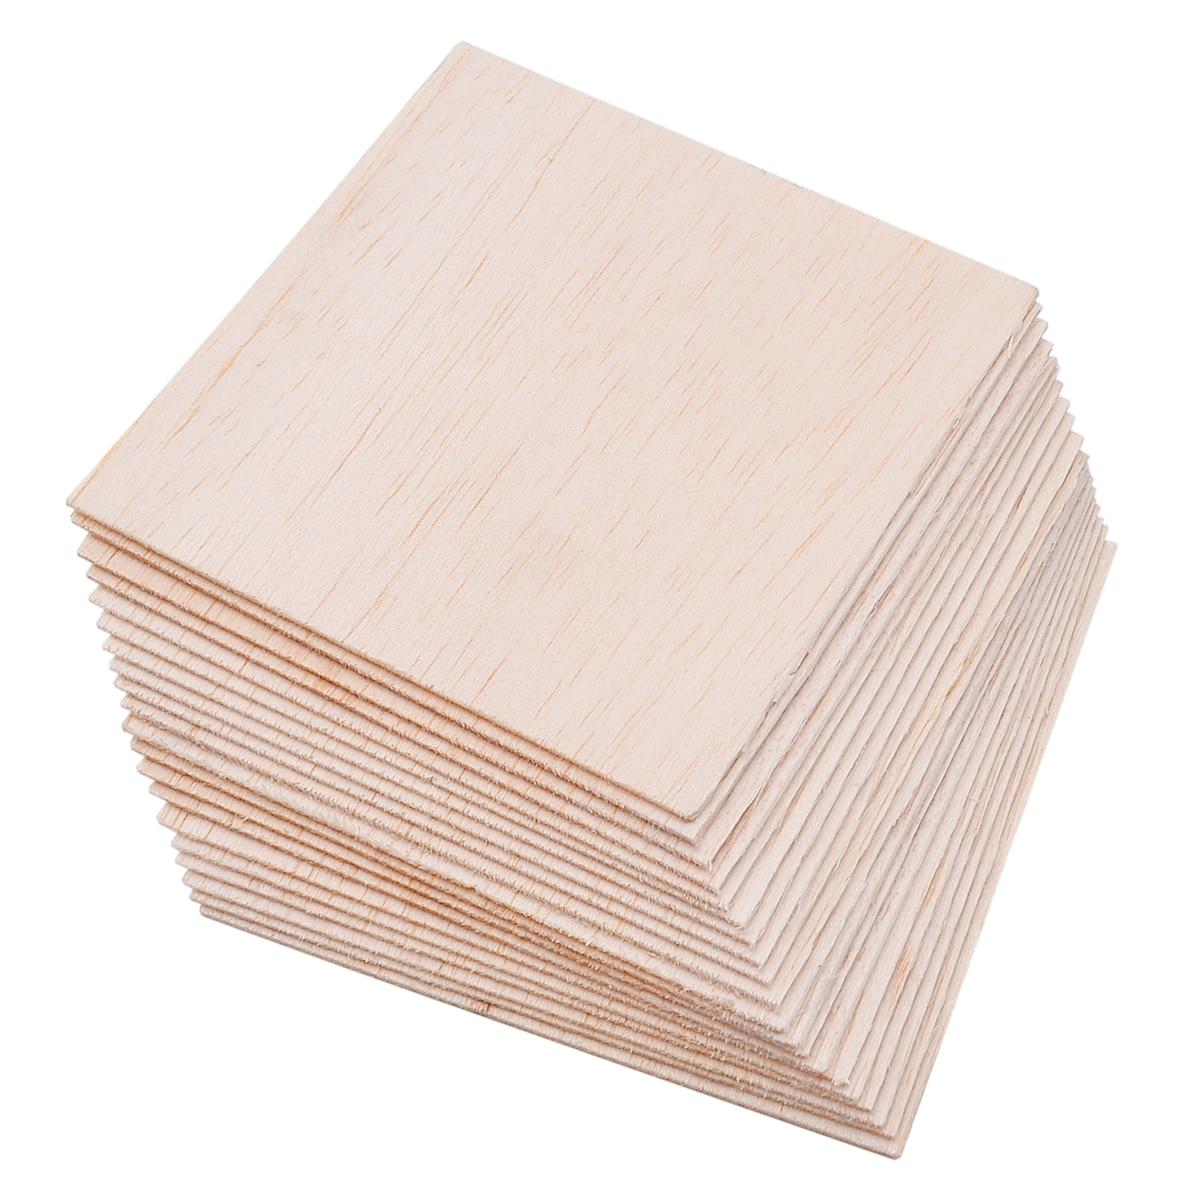 20pcs/set Balsa Wood Sheets Wooden Plate Model For DIY House Ship Aircraft 100x100x1mm